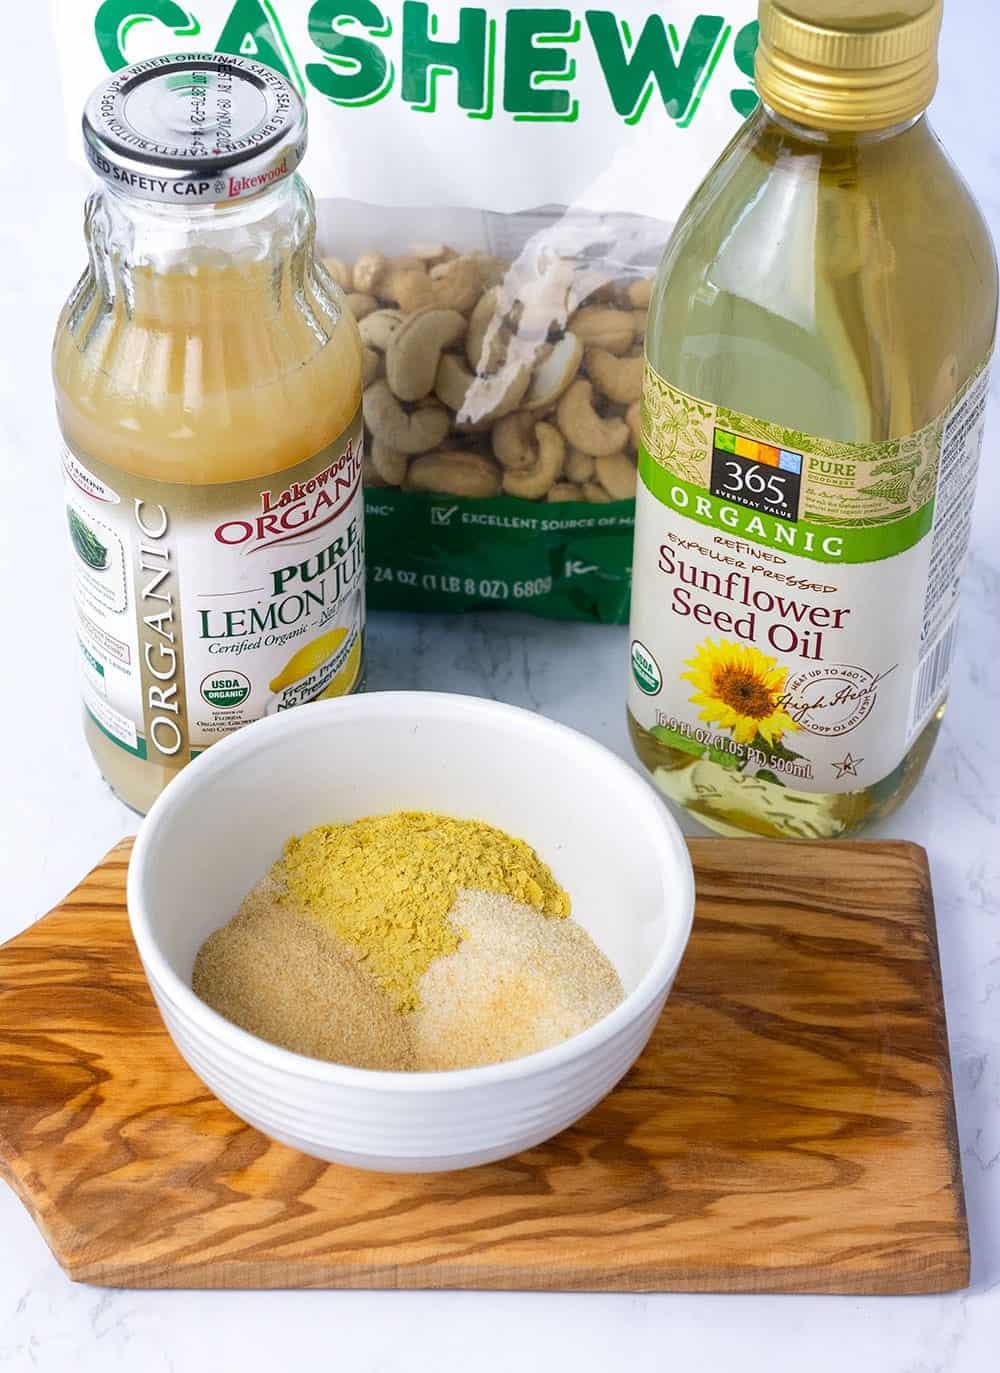 vegan mayo ingredients, lemon juice, sunflower oil, cashews, yeast flakes, onion powder, garlic powder, salt, sugar